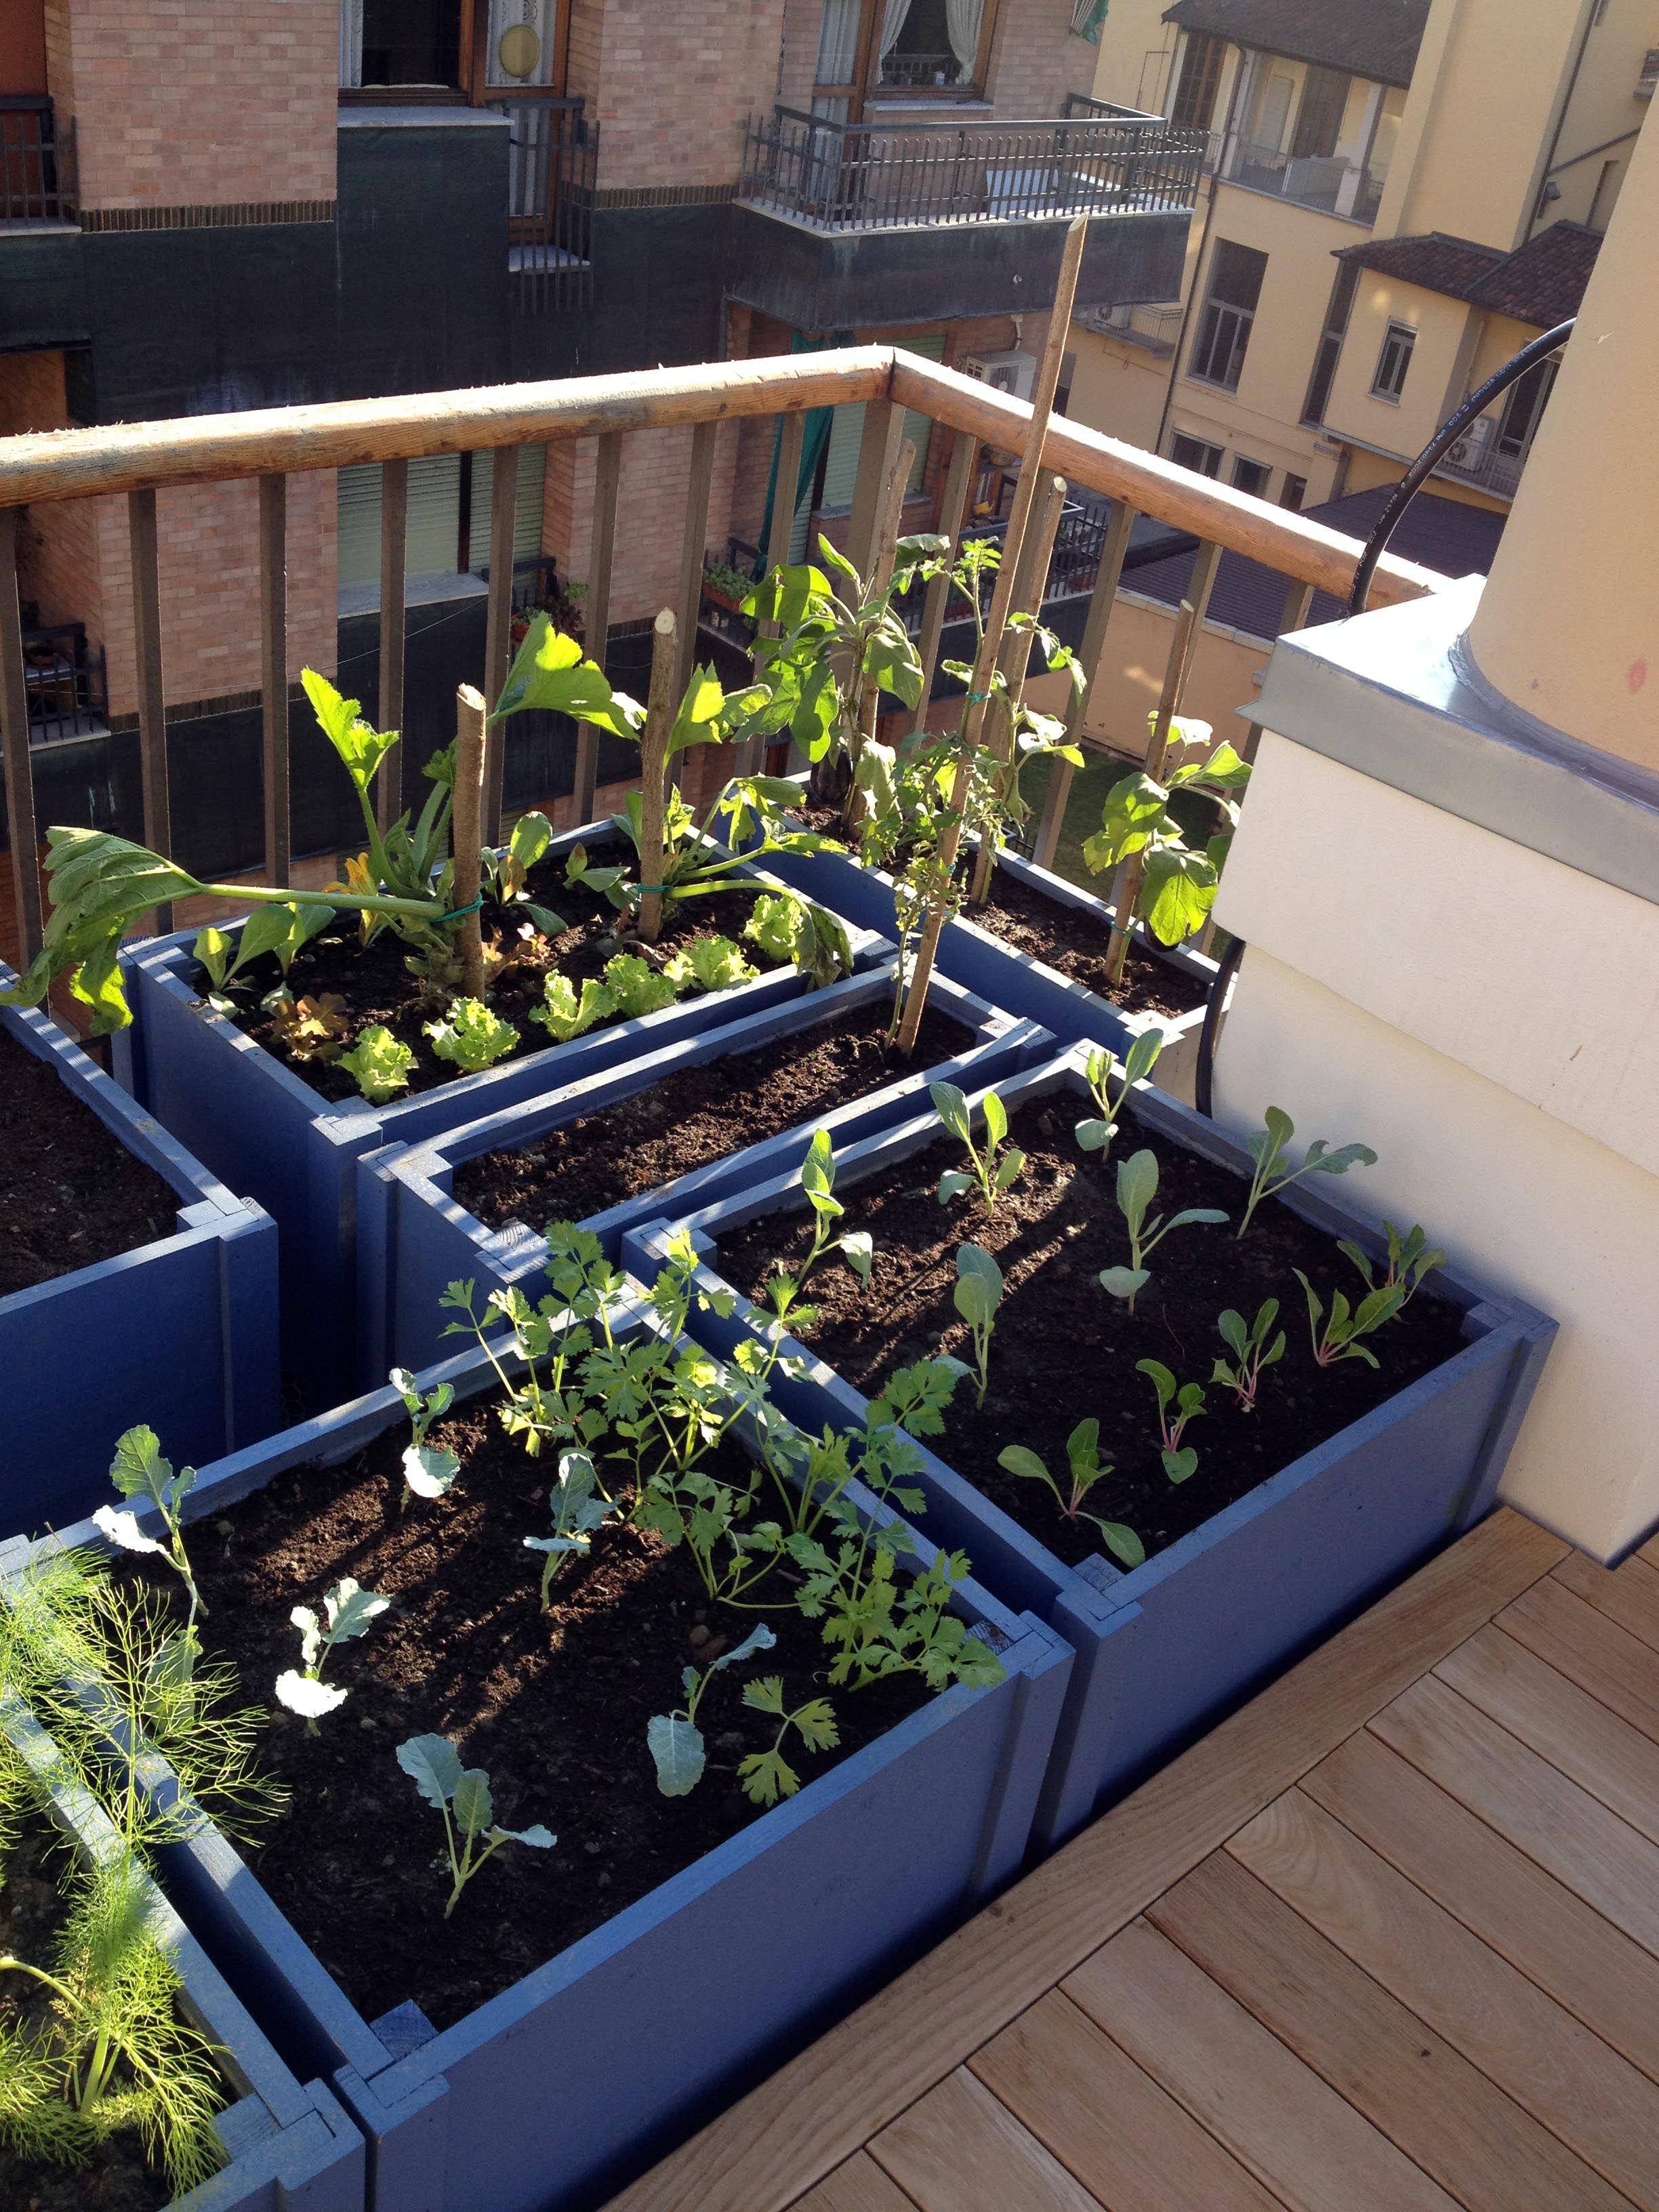 Orto in terrazzo | horta | Pinterest | Garden works and Gardens